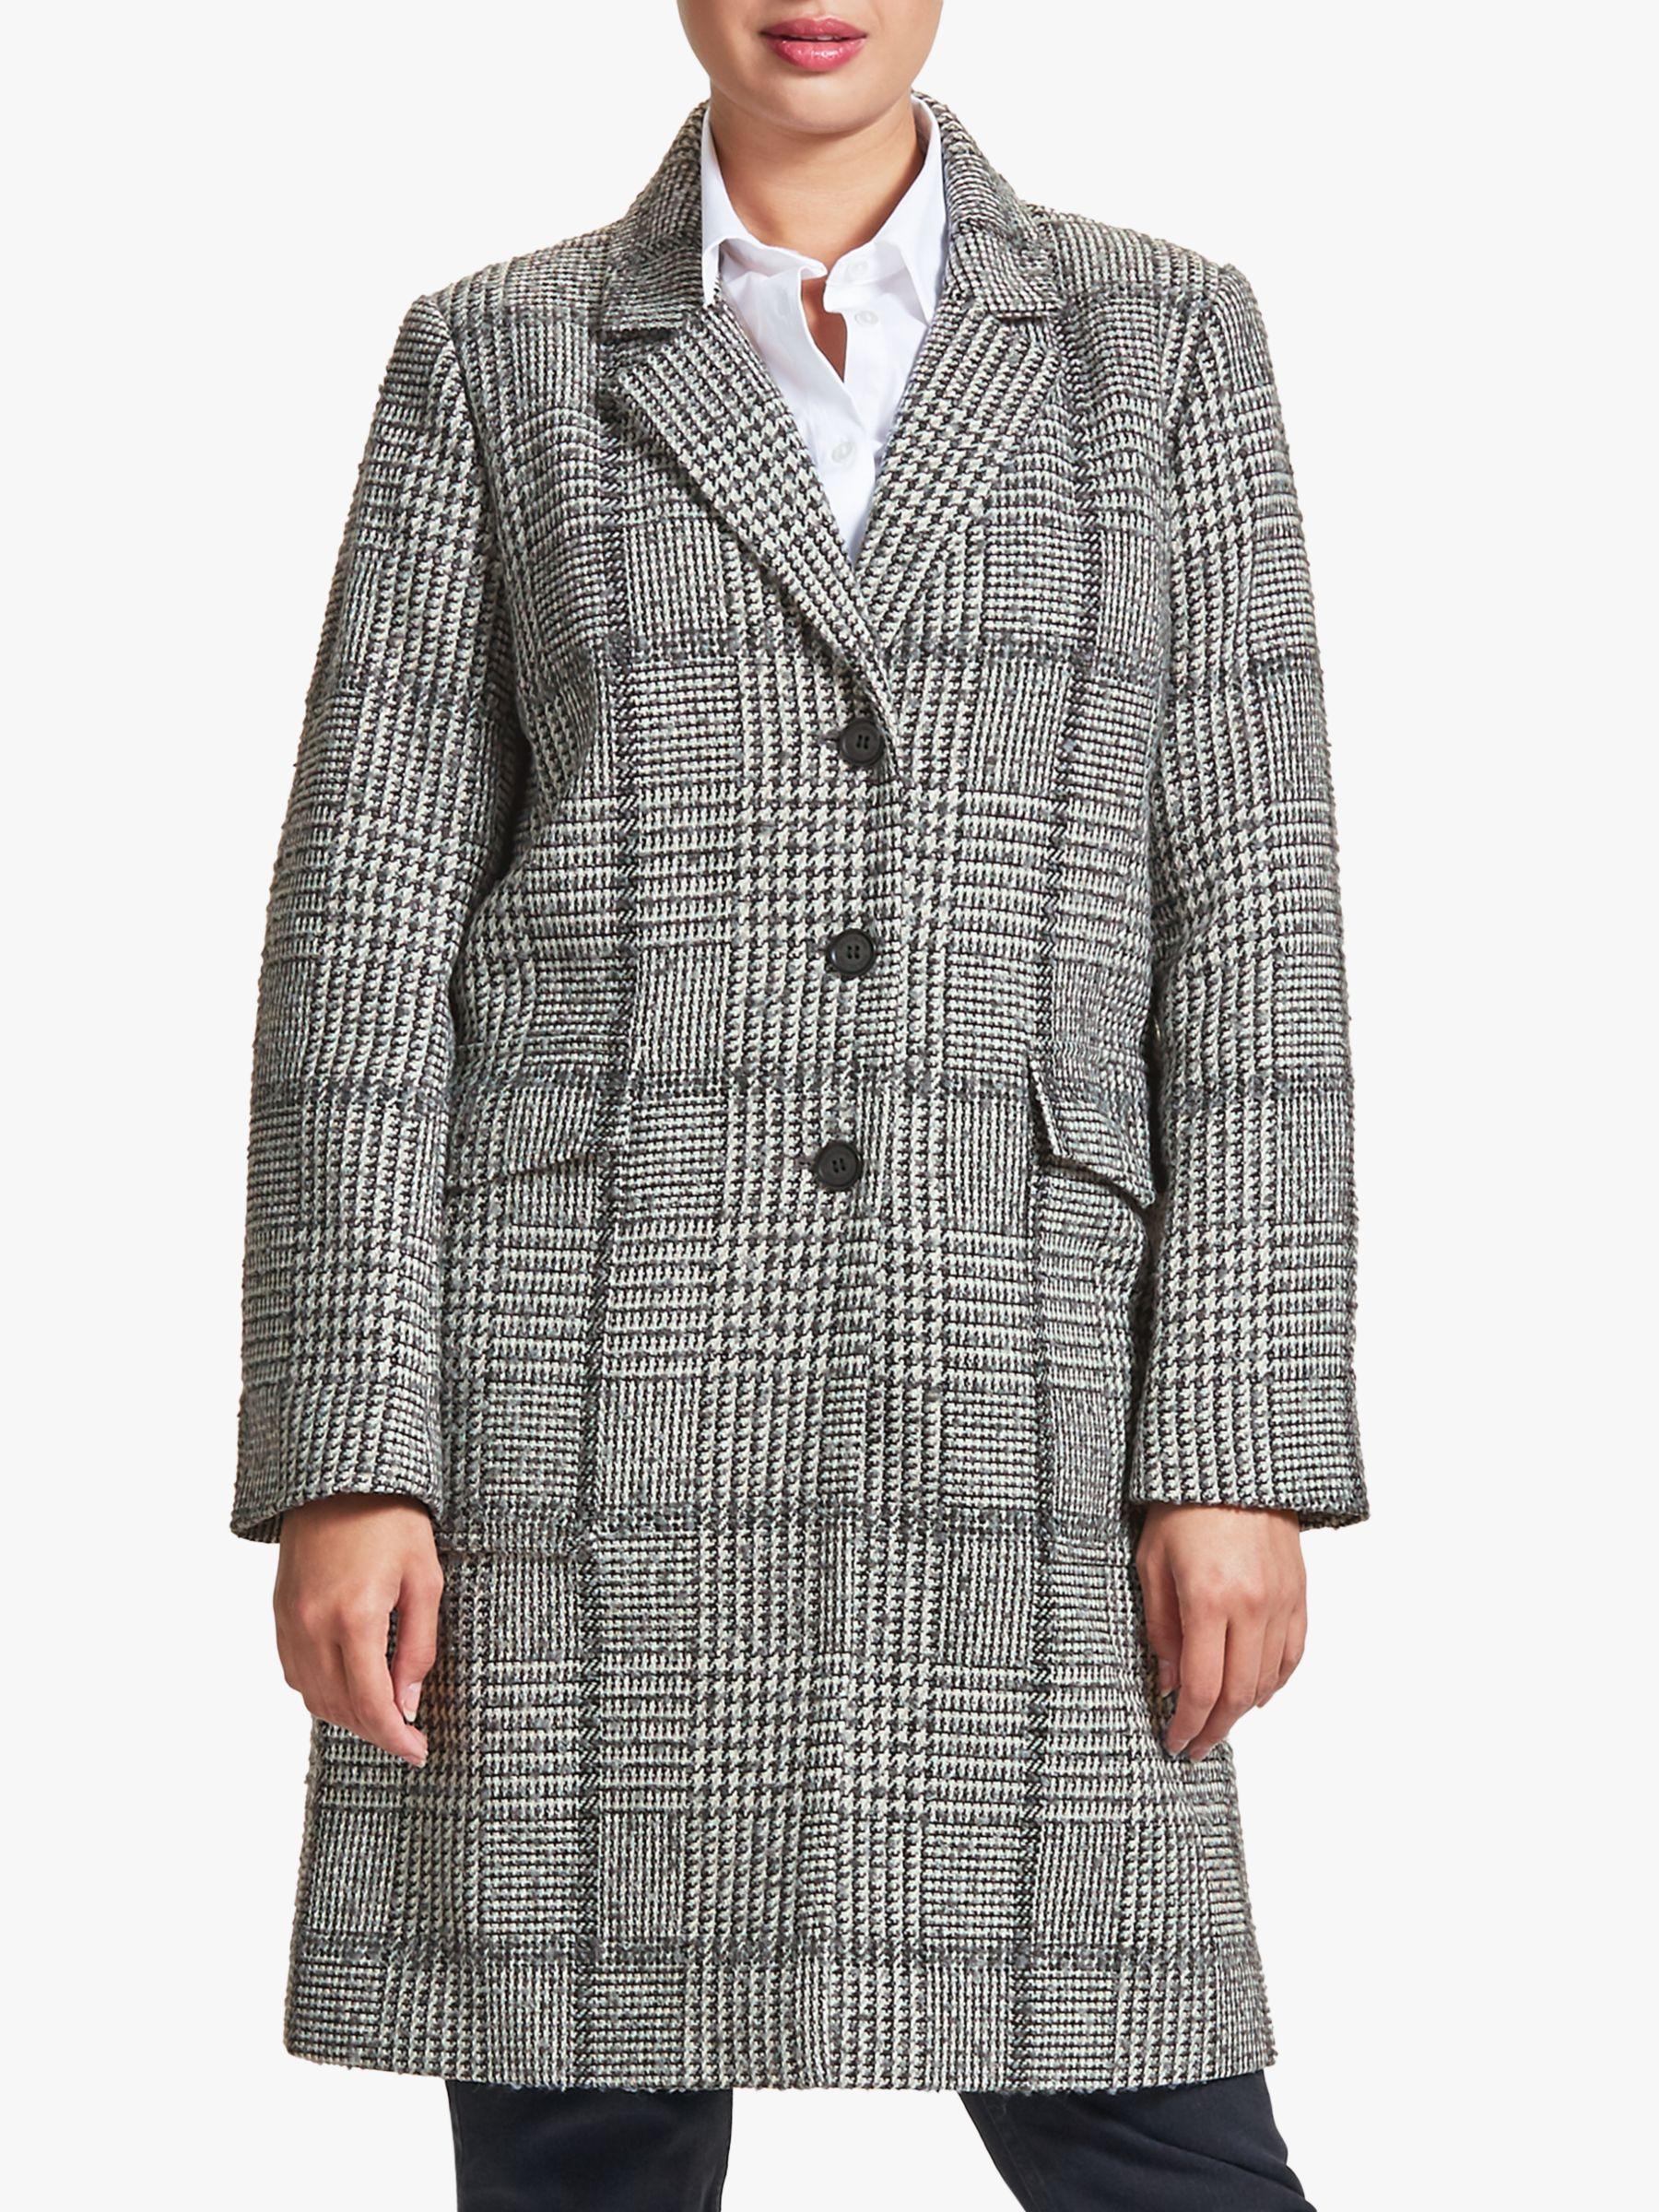 Four Seasons Four Seasons Check Patch Coat, Grey